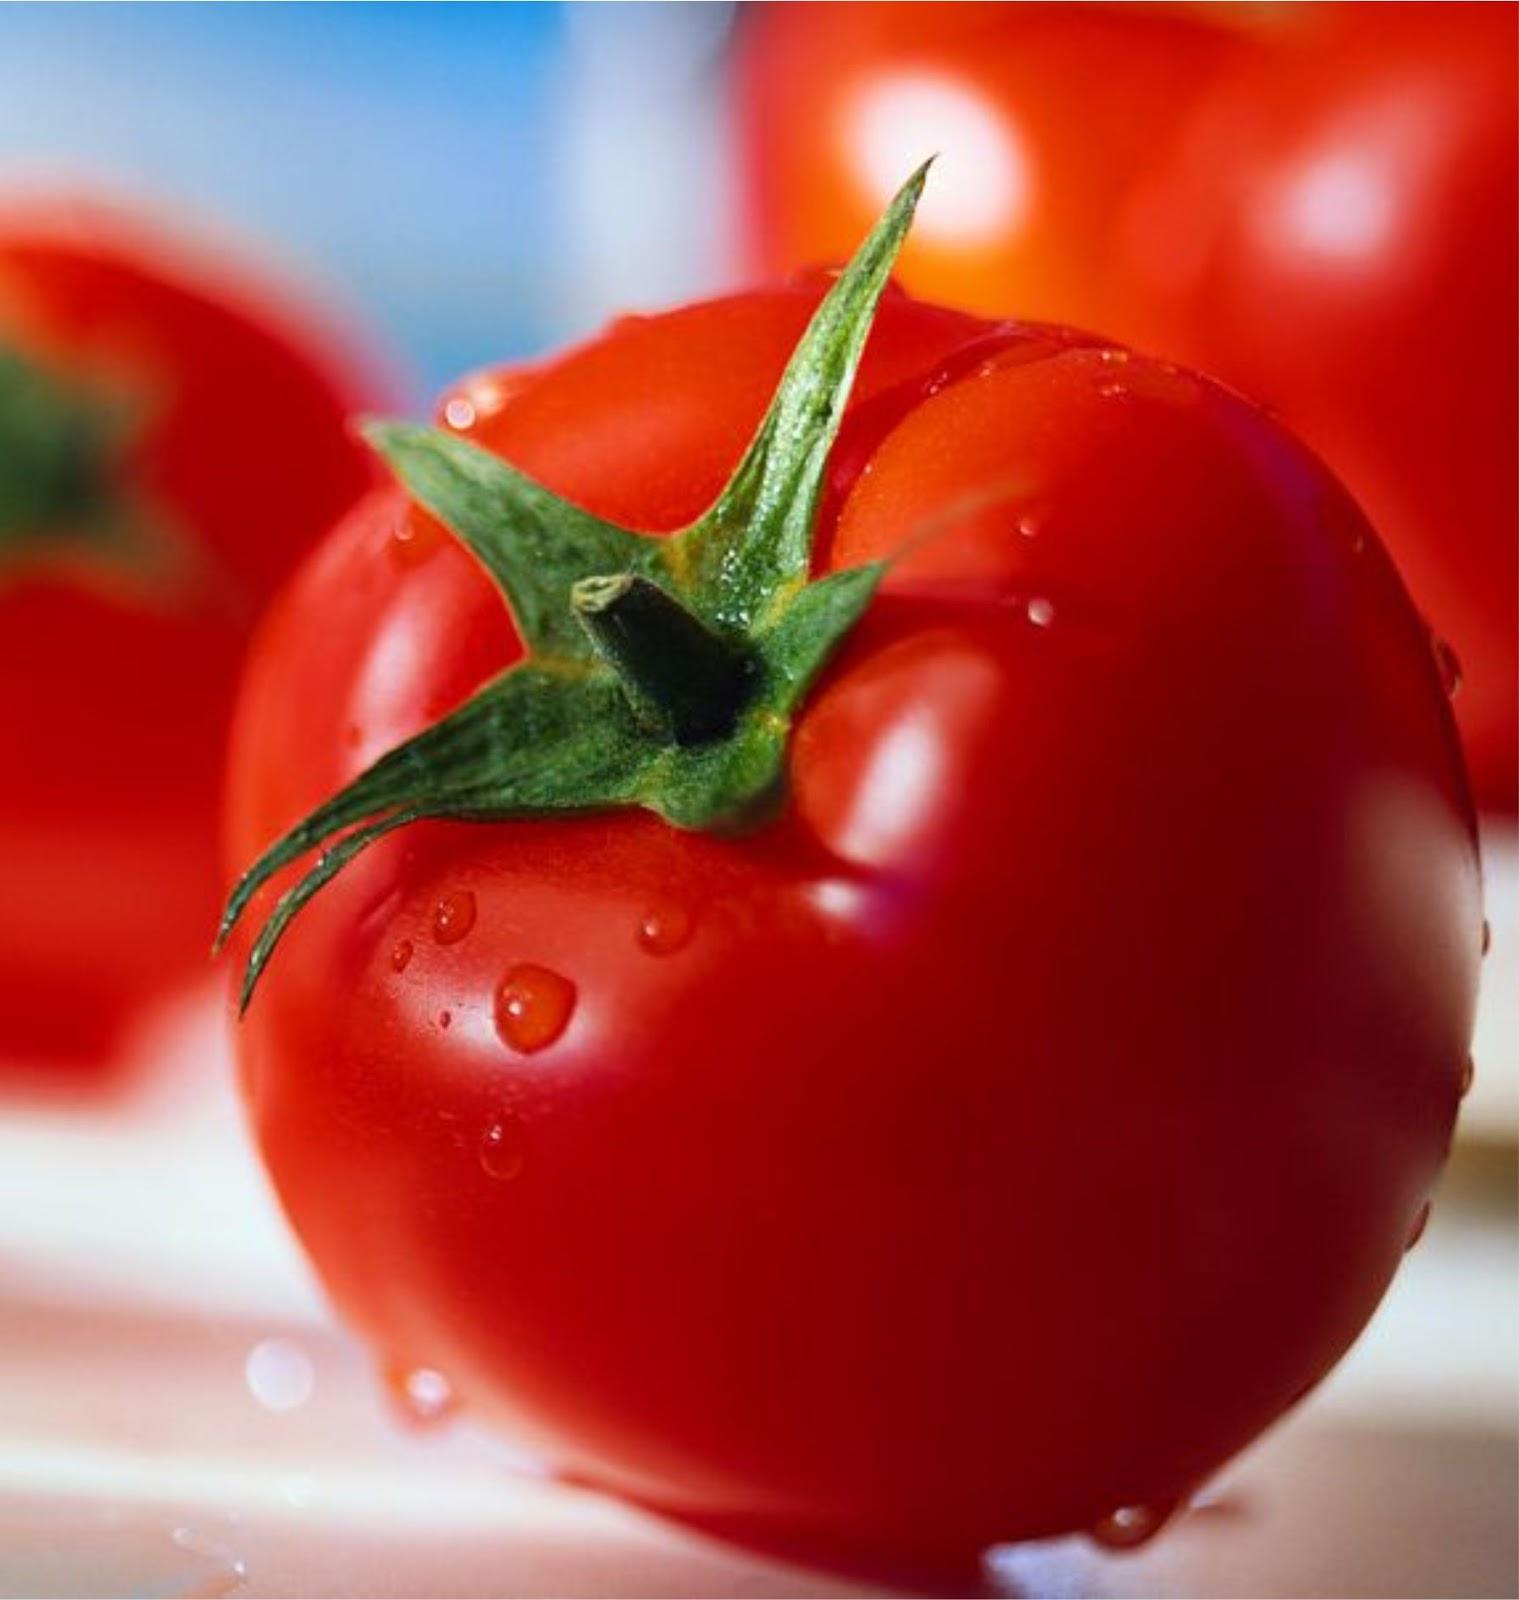 Cara Menghilangkan Jerawat Pada Foto: Cara Mudah Mengatasi Jerawat Dan Komedo Dengan Tomat